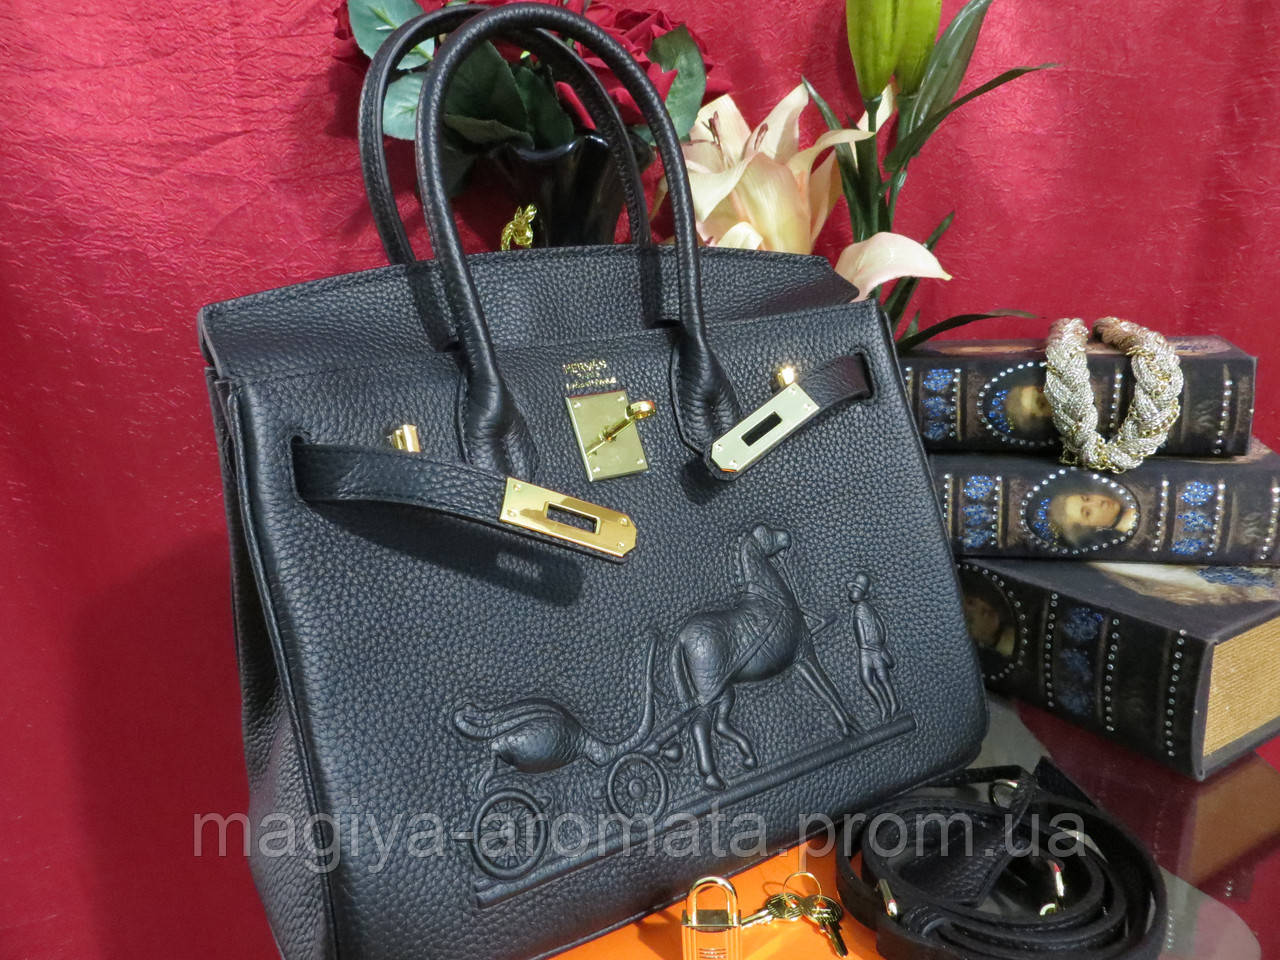 6bbe113e991d Женская шикарная сумка Hermes Birkin 30 см Original quality - Магия Аромата  - Парфюмерия, Брендовые